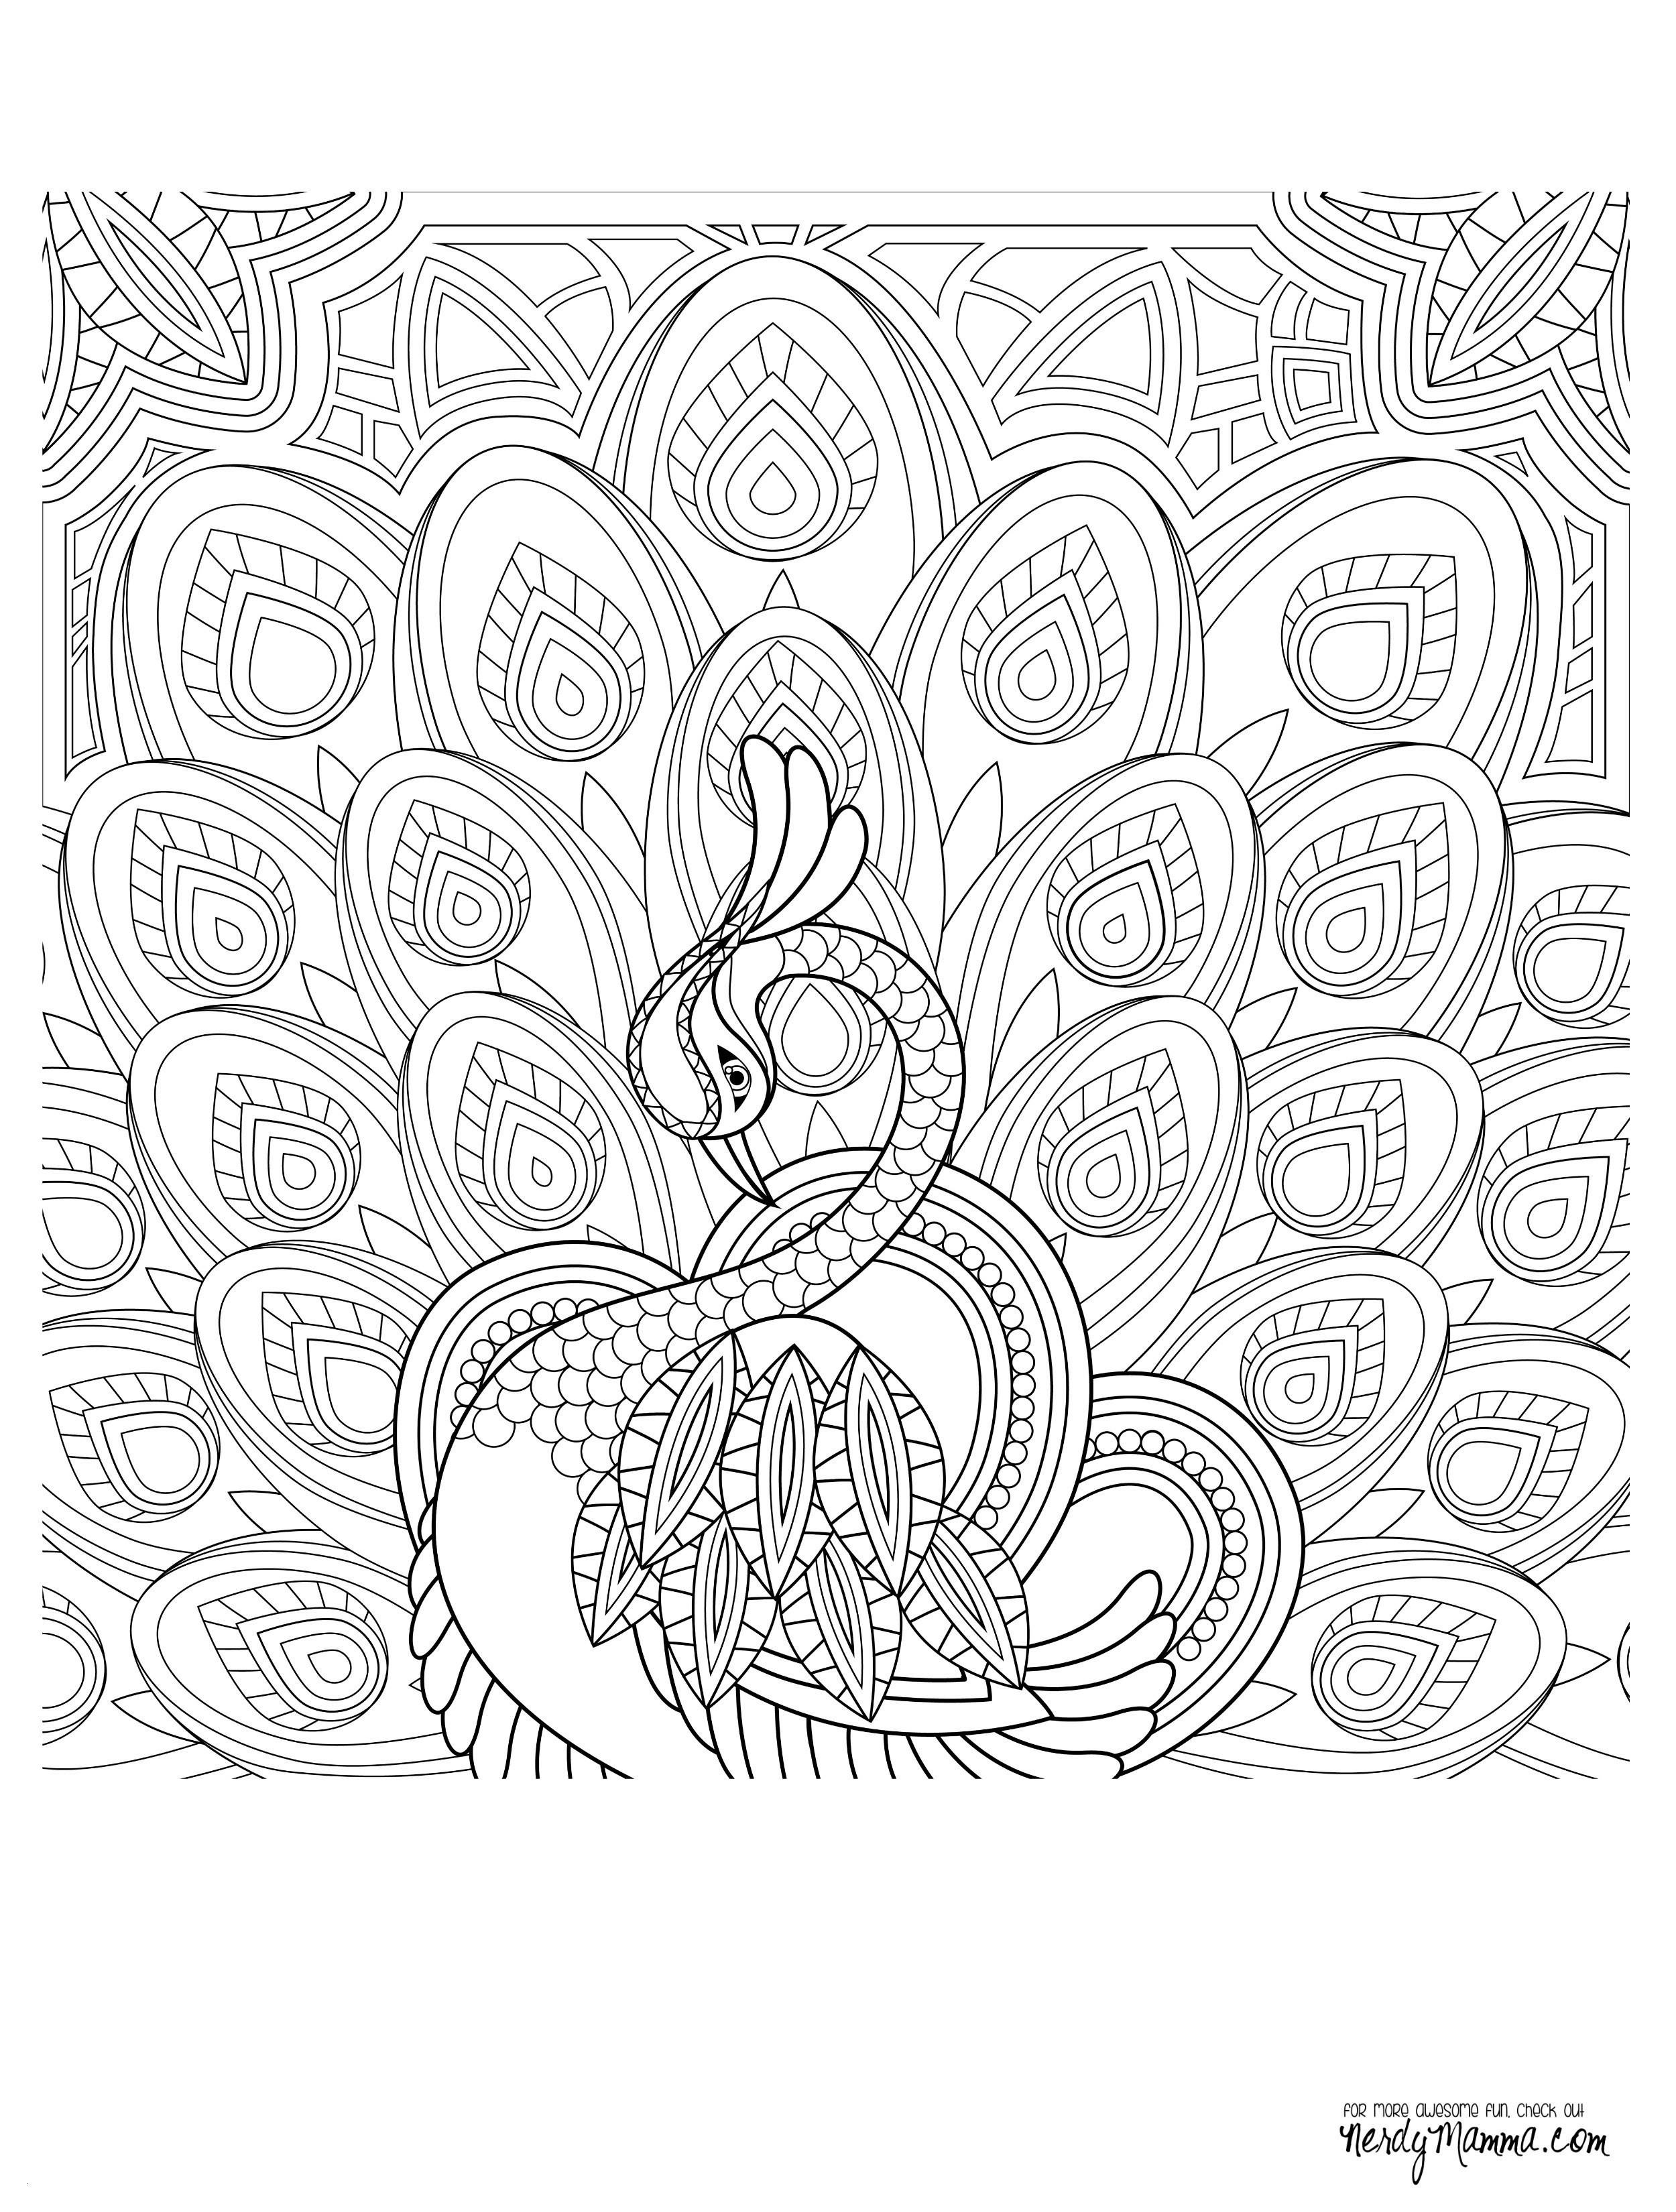 Ausmalbild Mandala Eule Genial Eule Malvorlagen Pdf Exzellente 40 Malvorlagen Mandala Scoredatscore Bild